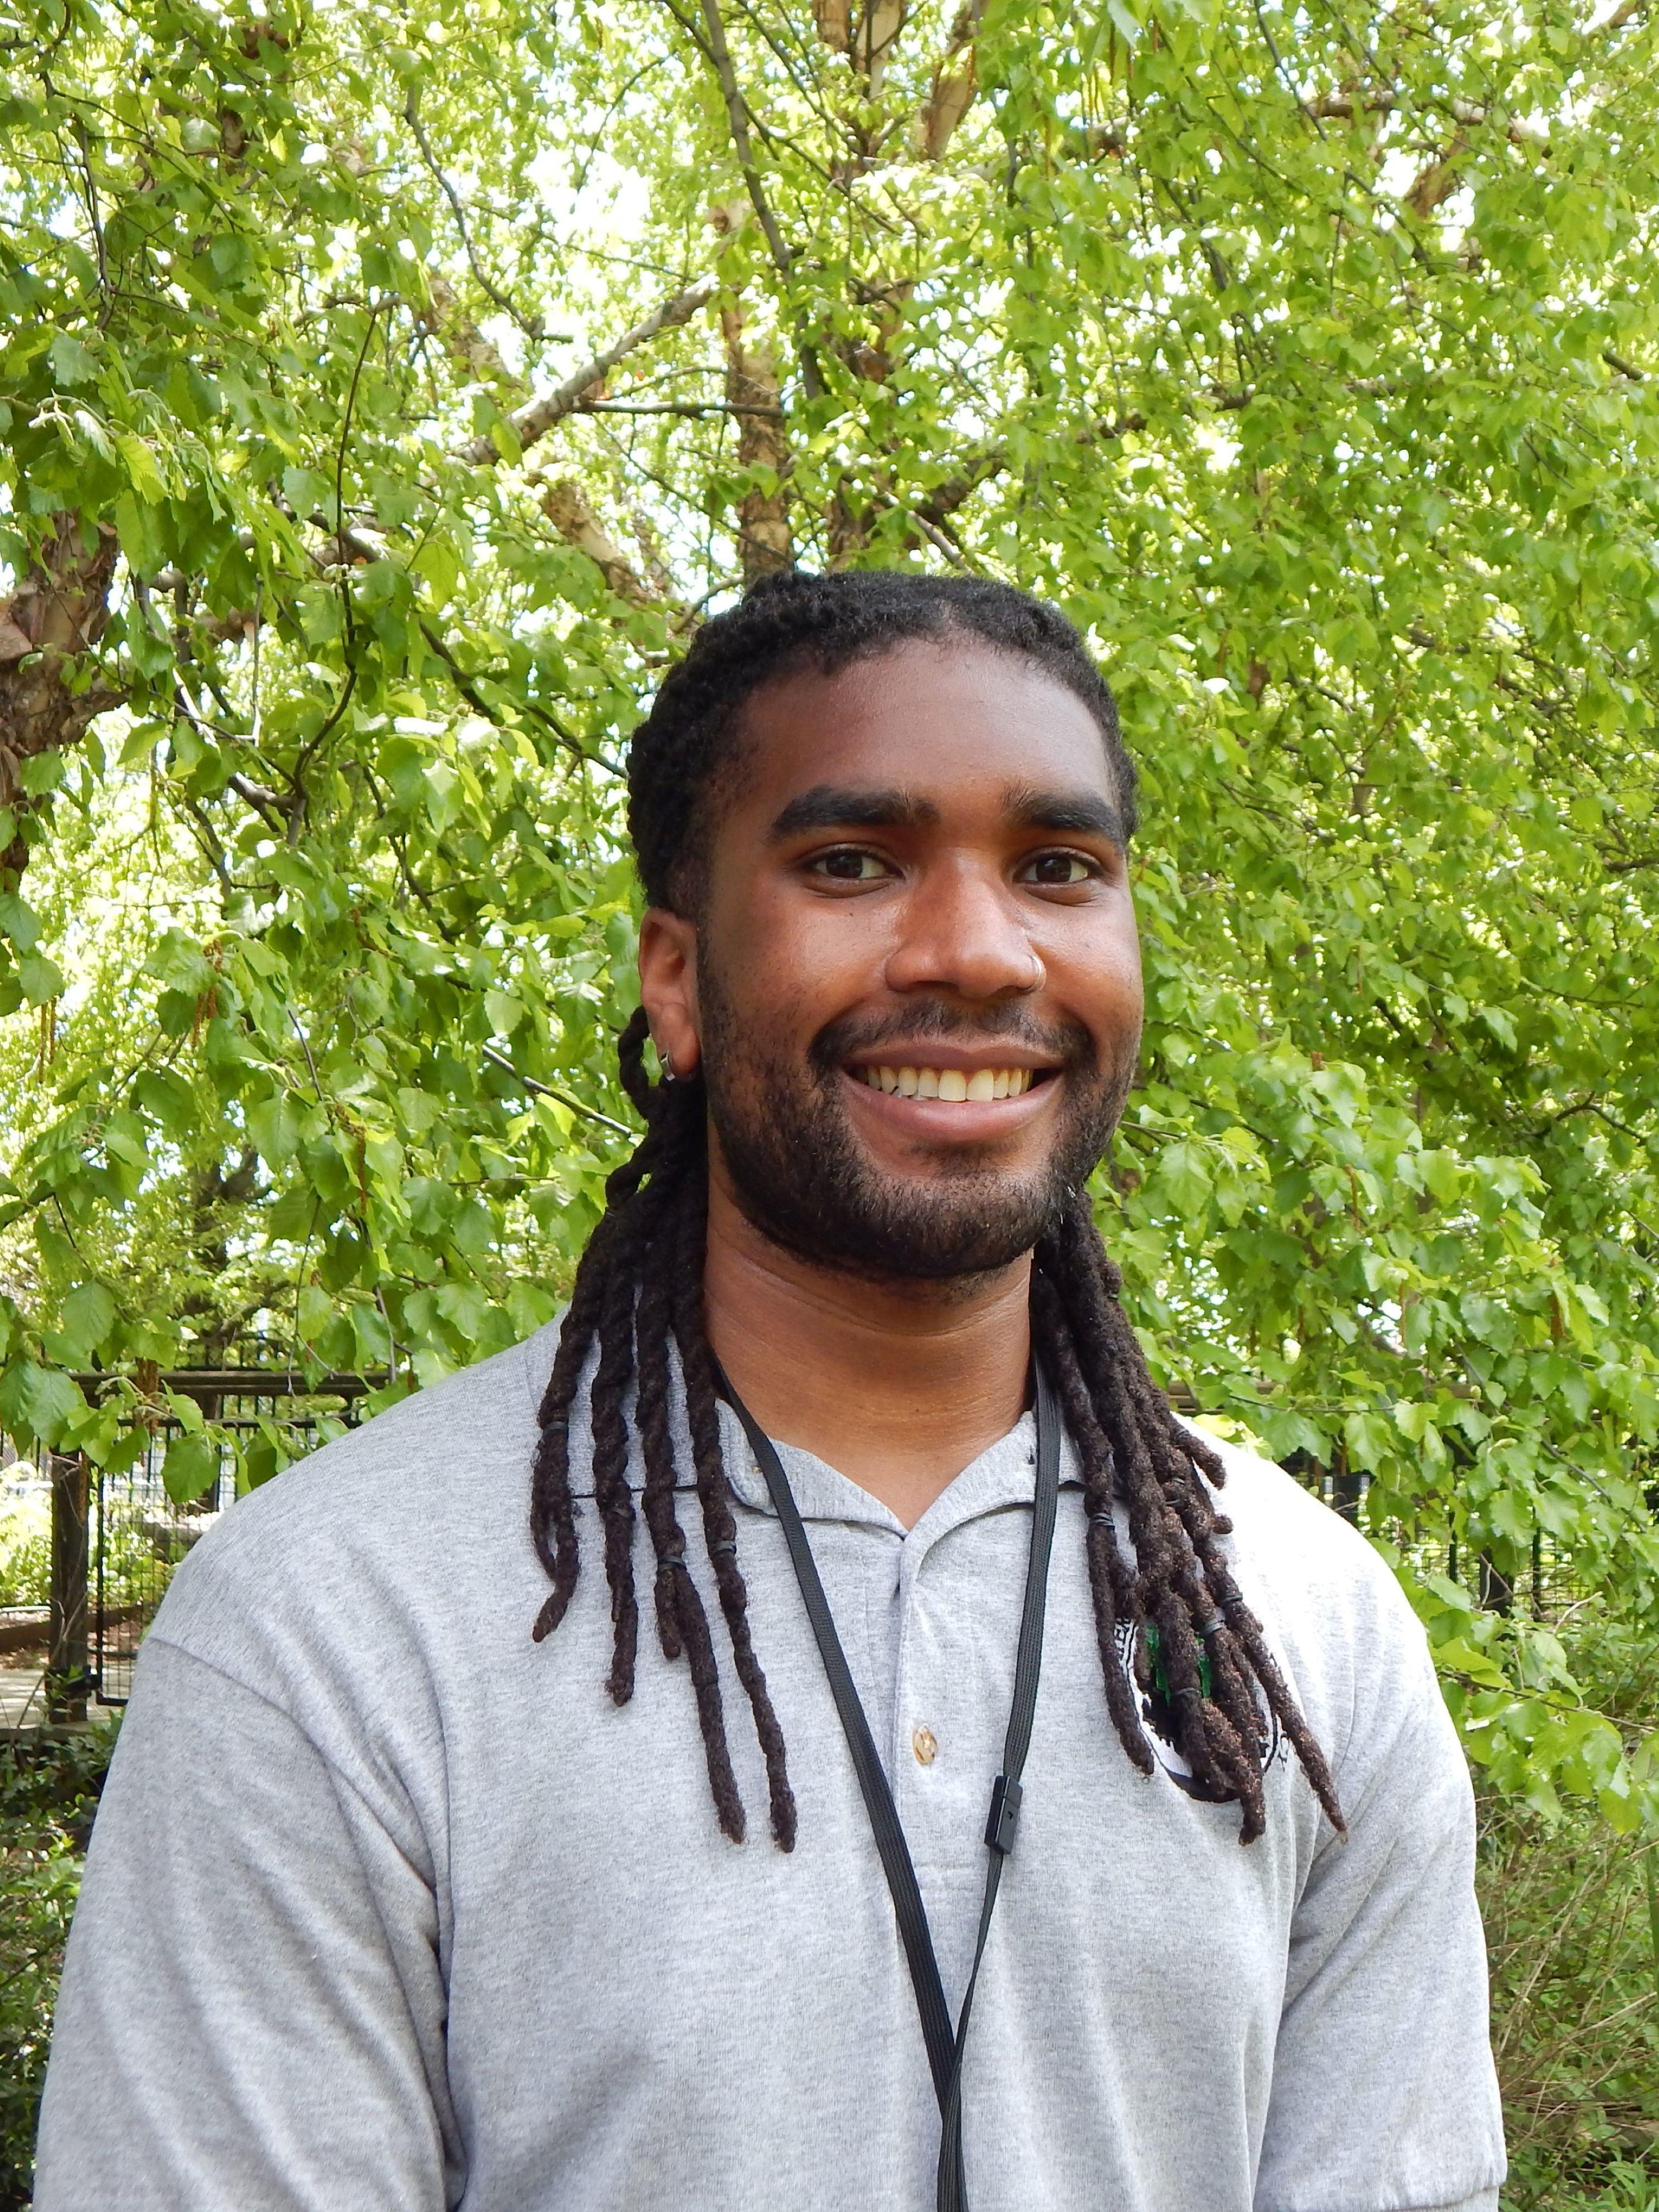 Program Manager, Urban Agriculture & Food Programs